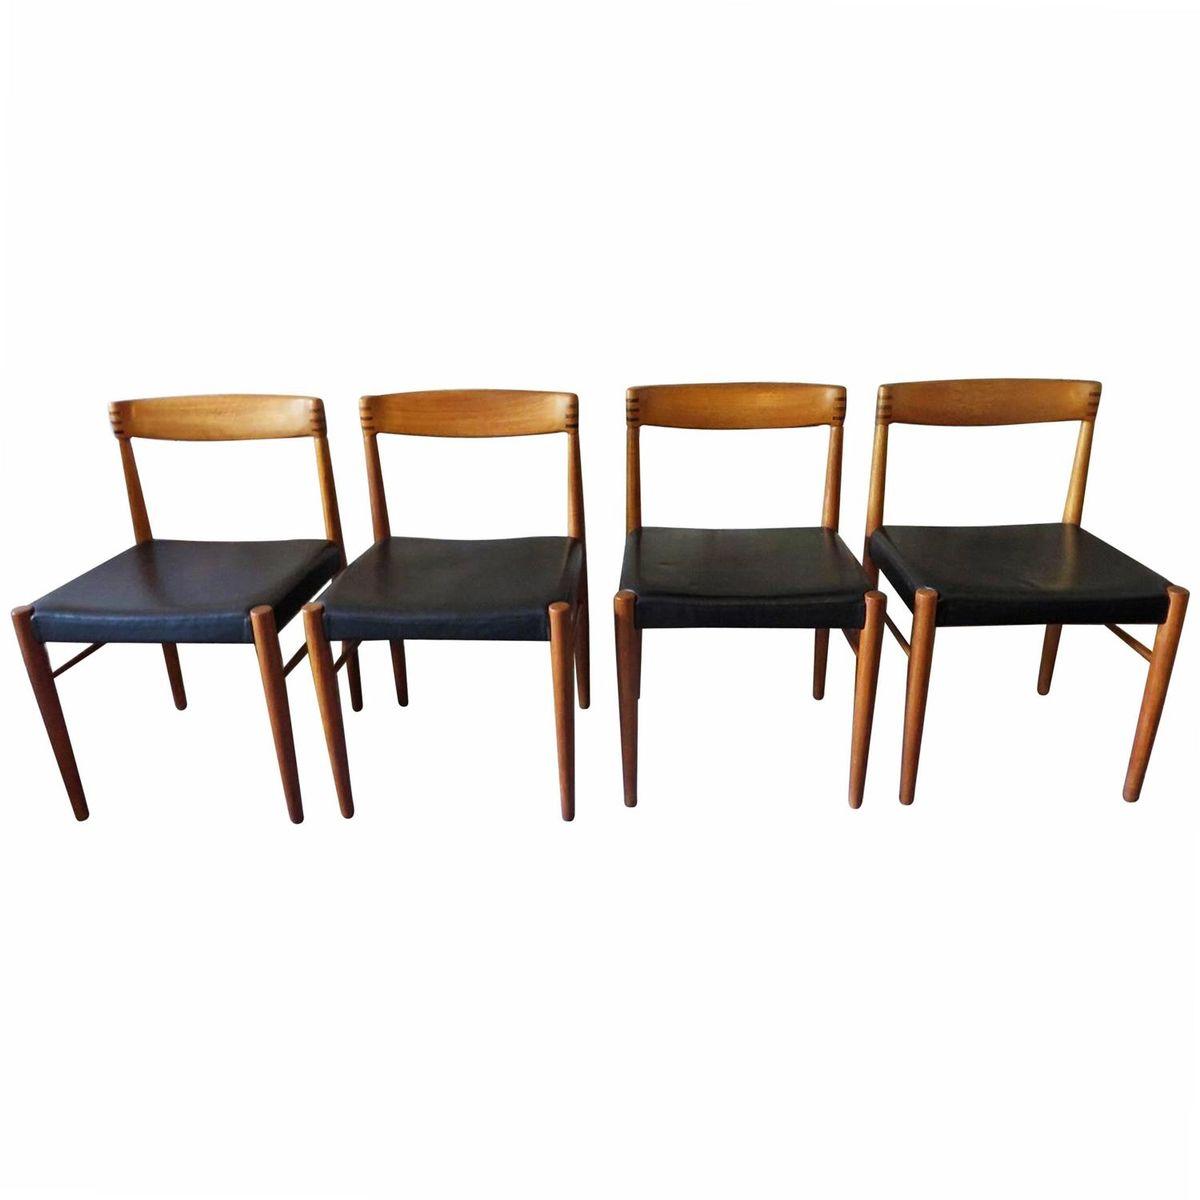 esszimmerst hle aus teakholz und leder von henry w klein f r bramin 1960er 4er set bei pamono. Black Bedroom Furniture Sets. Home Design Ideas